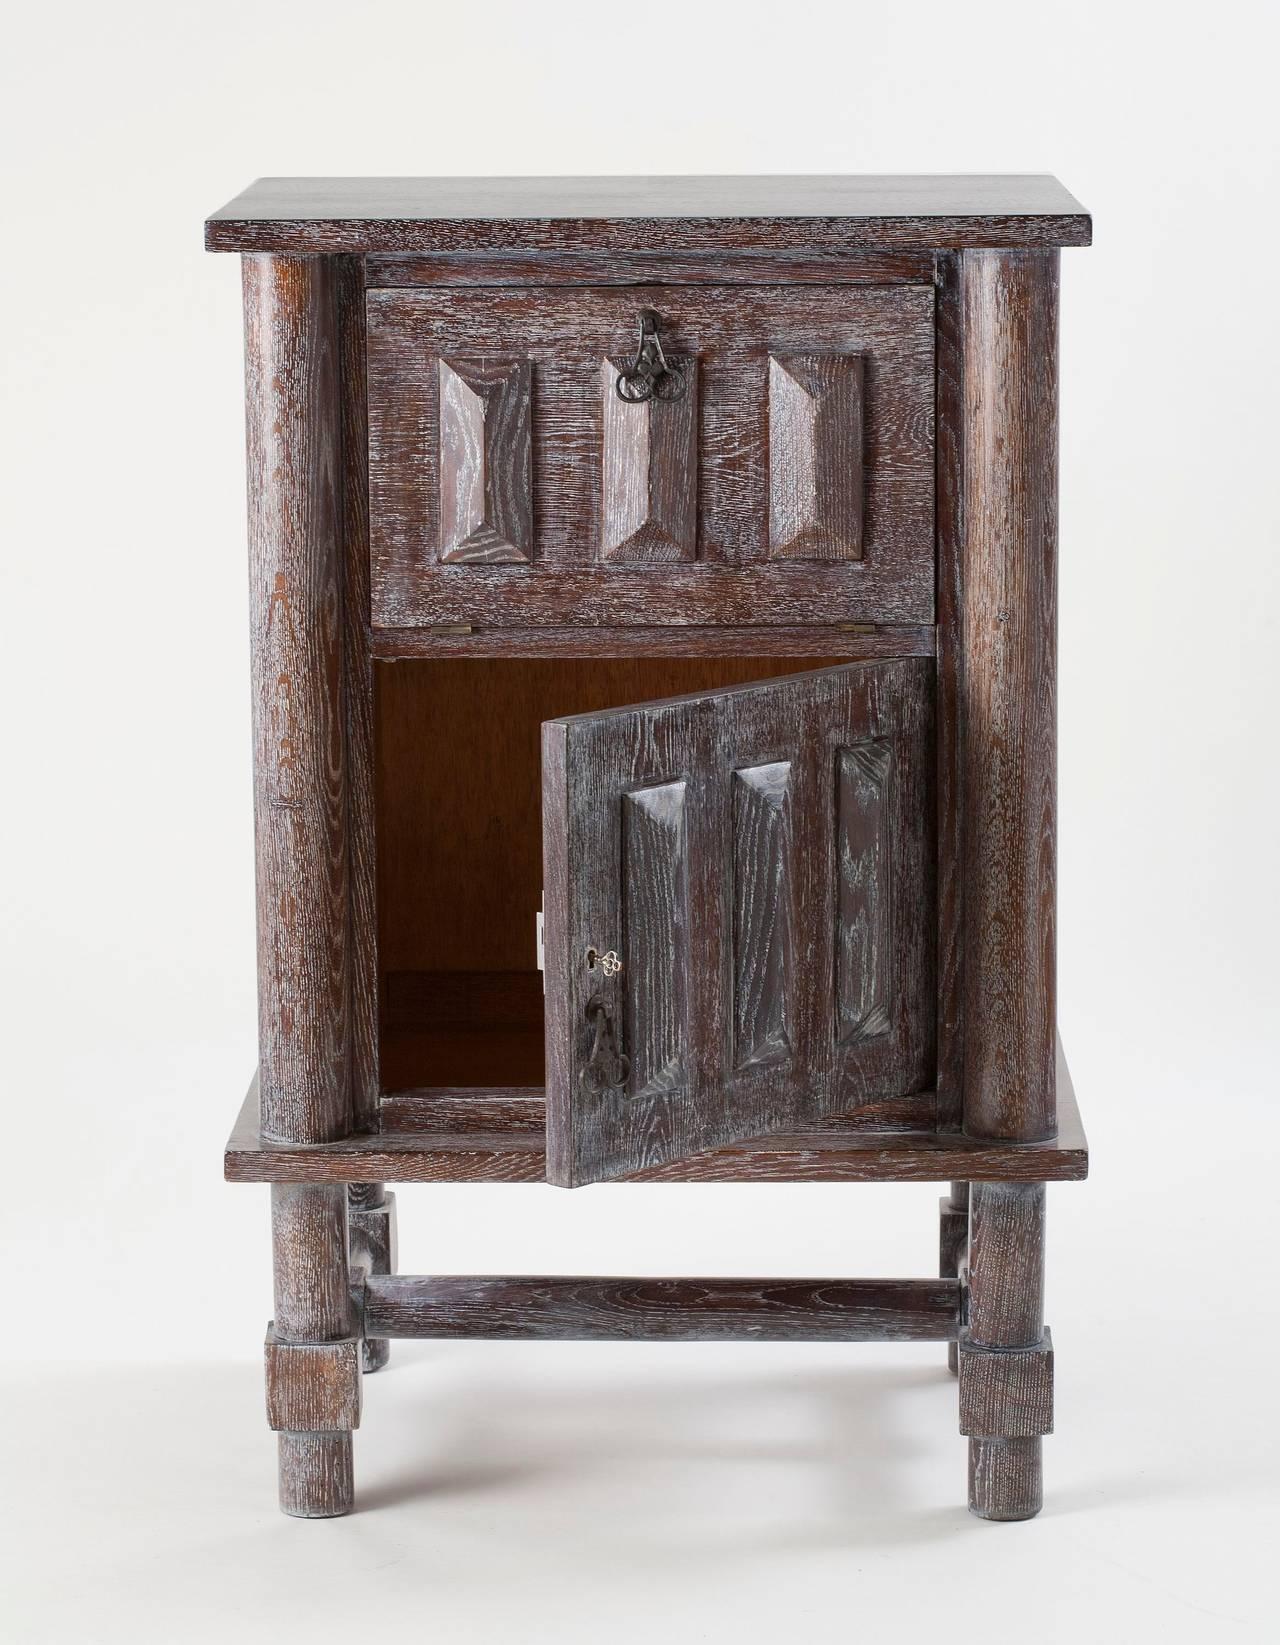 French Jacques Adnet, Limed Oak Cabinet, France, C. 1946 For Sale